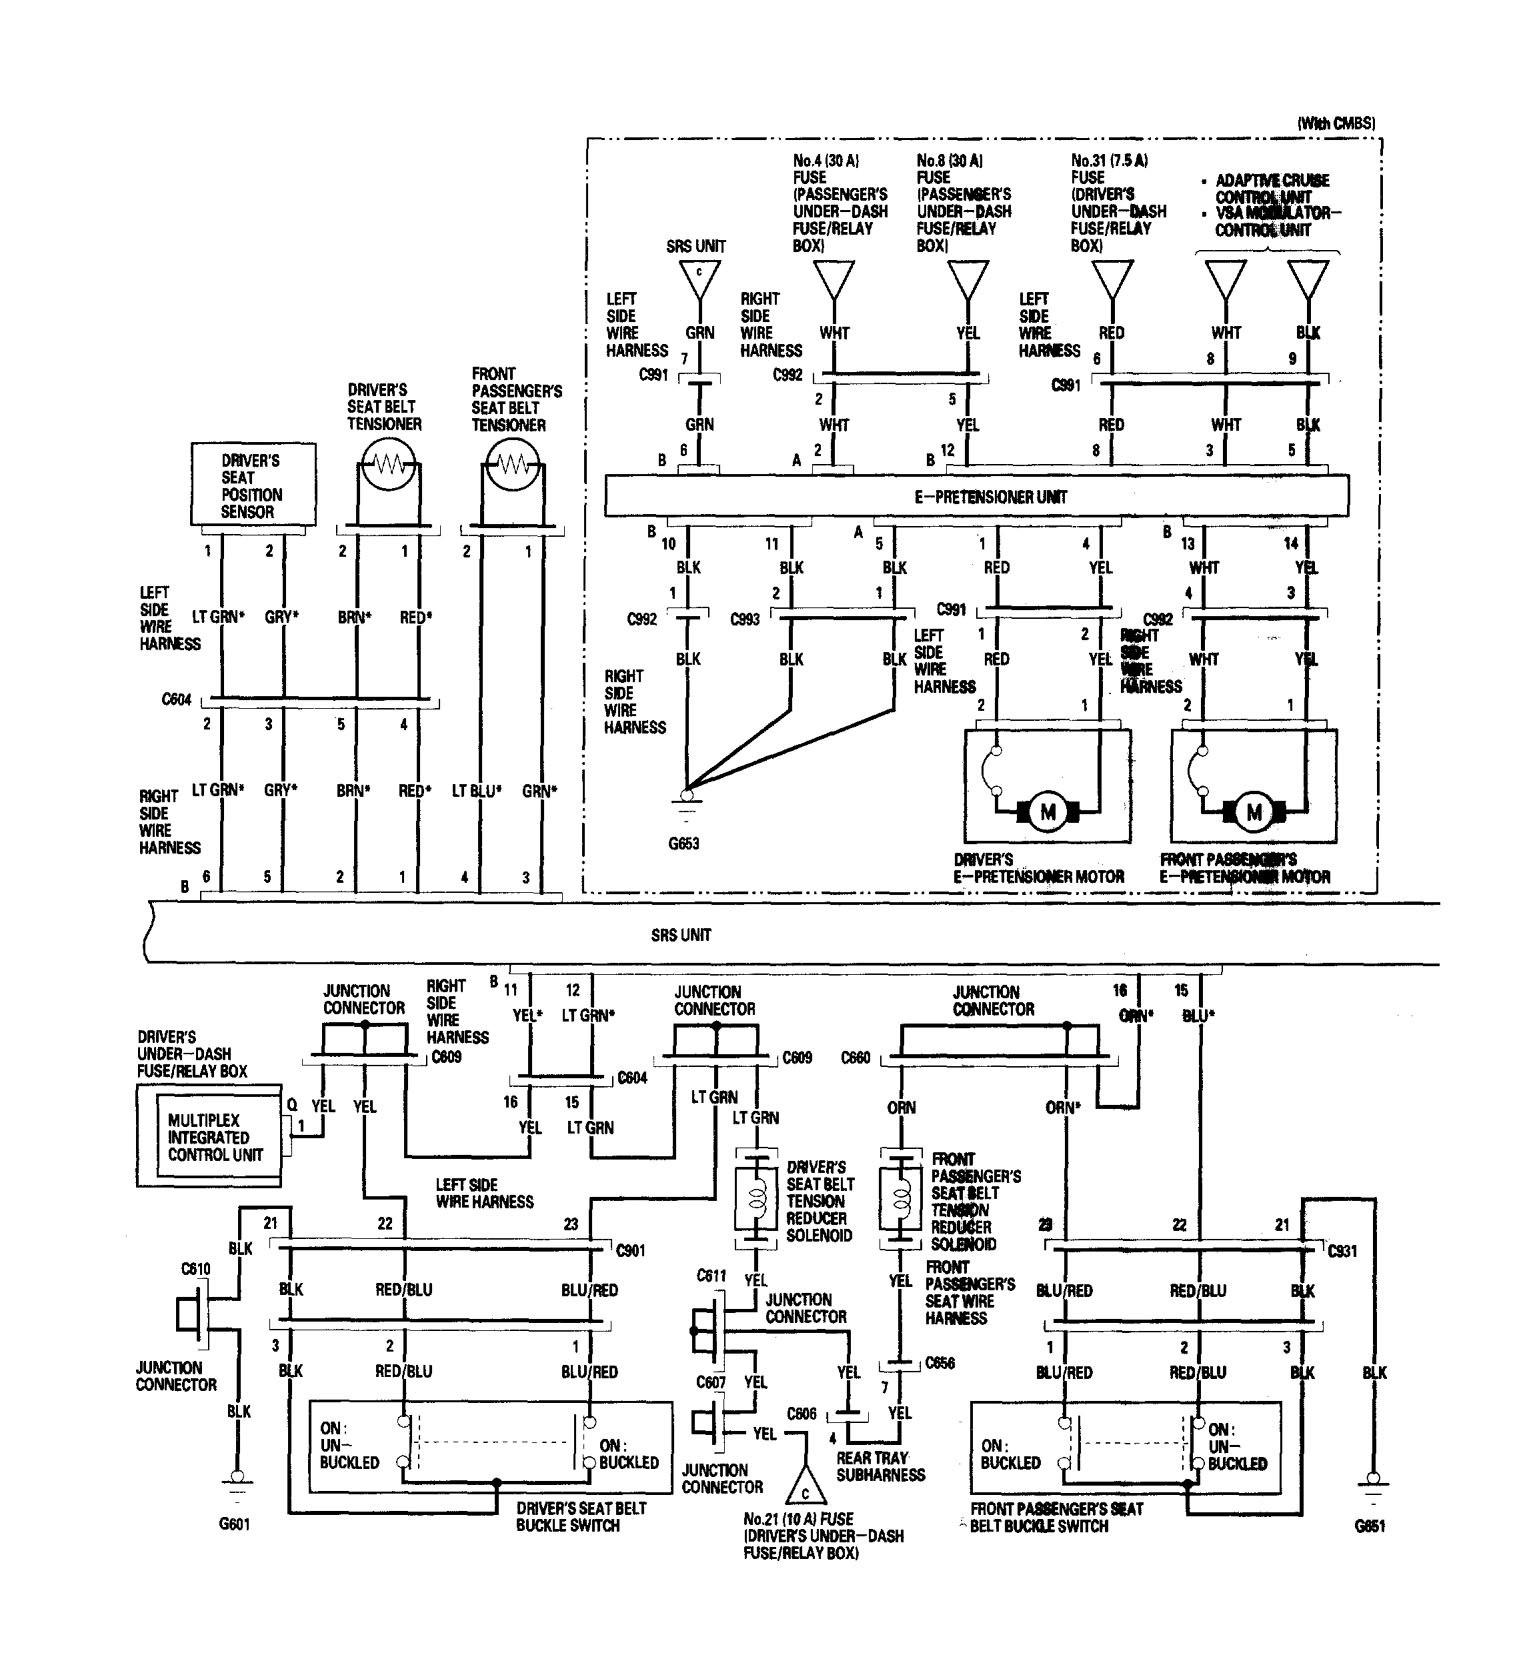 acura rl  2006  - wiring diagrams - air bags